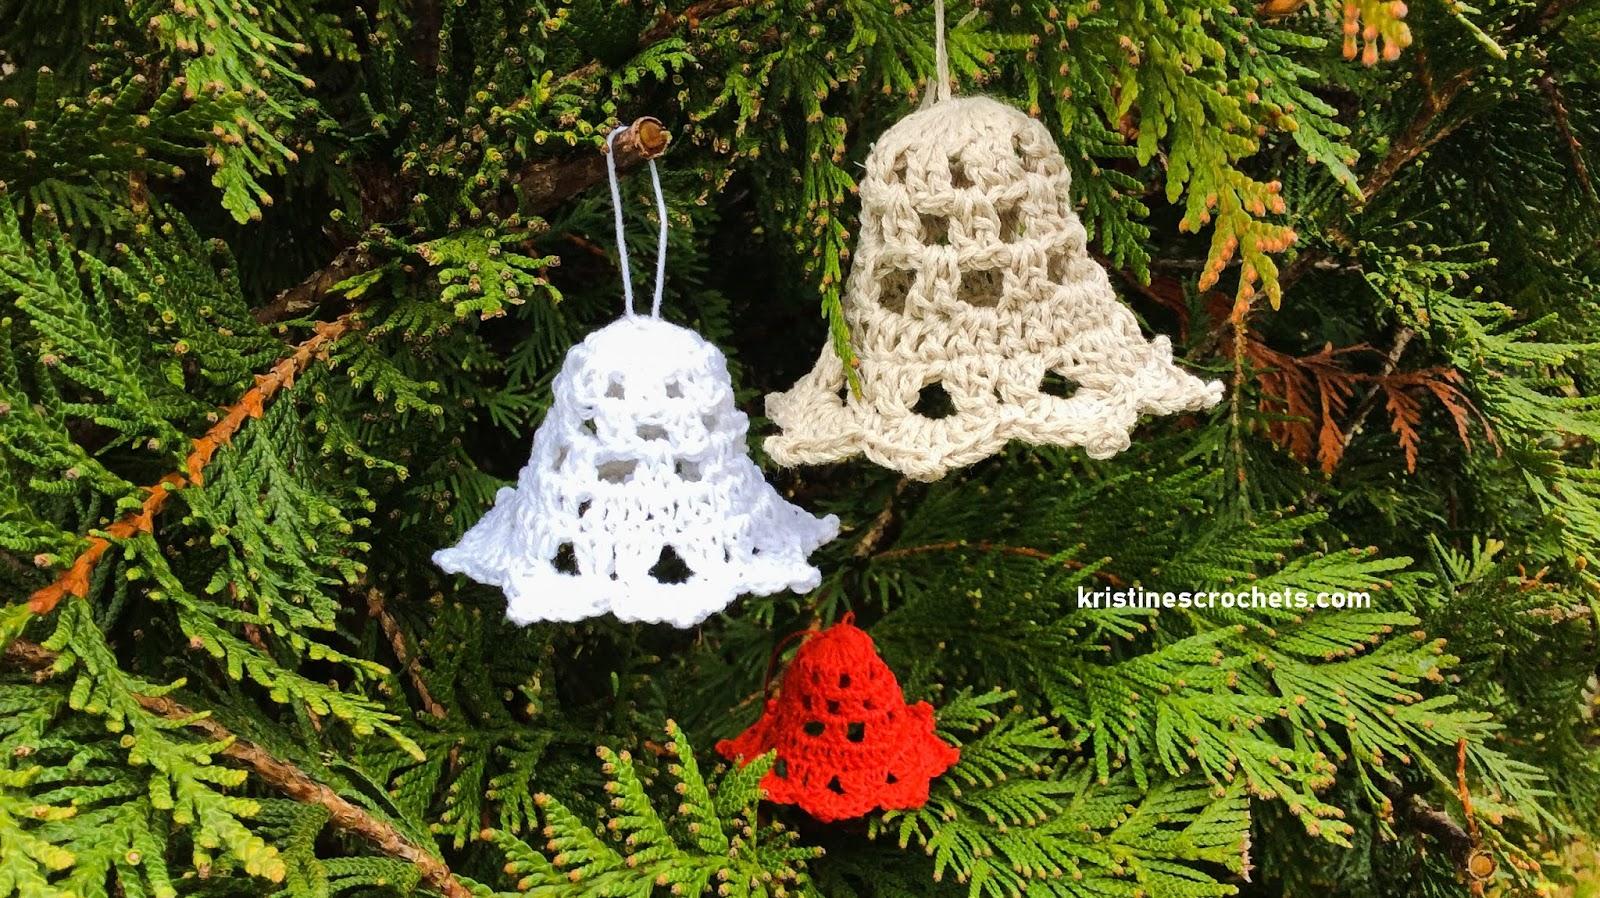 Kristinescrochets Christmas Bell Decoration Free Crochet Pattern